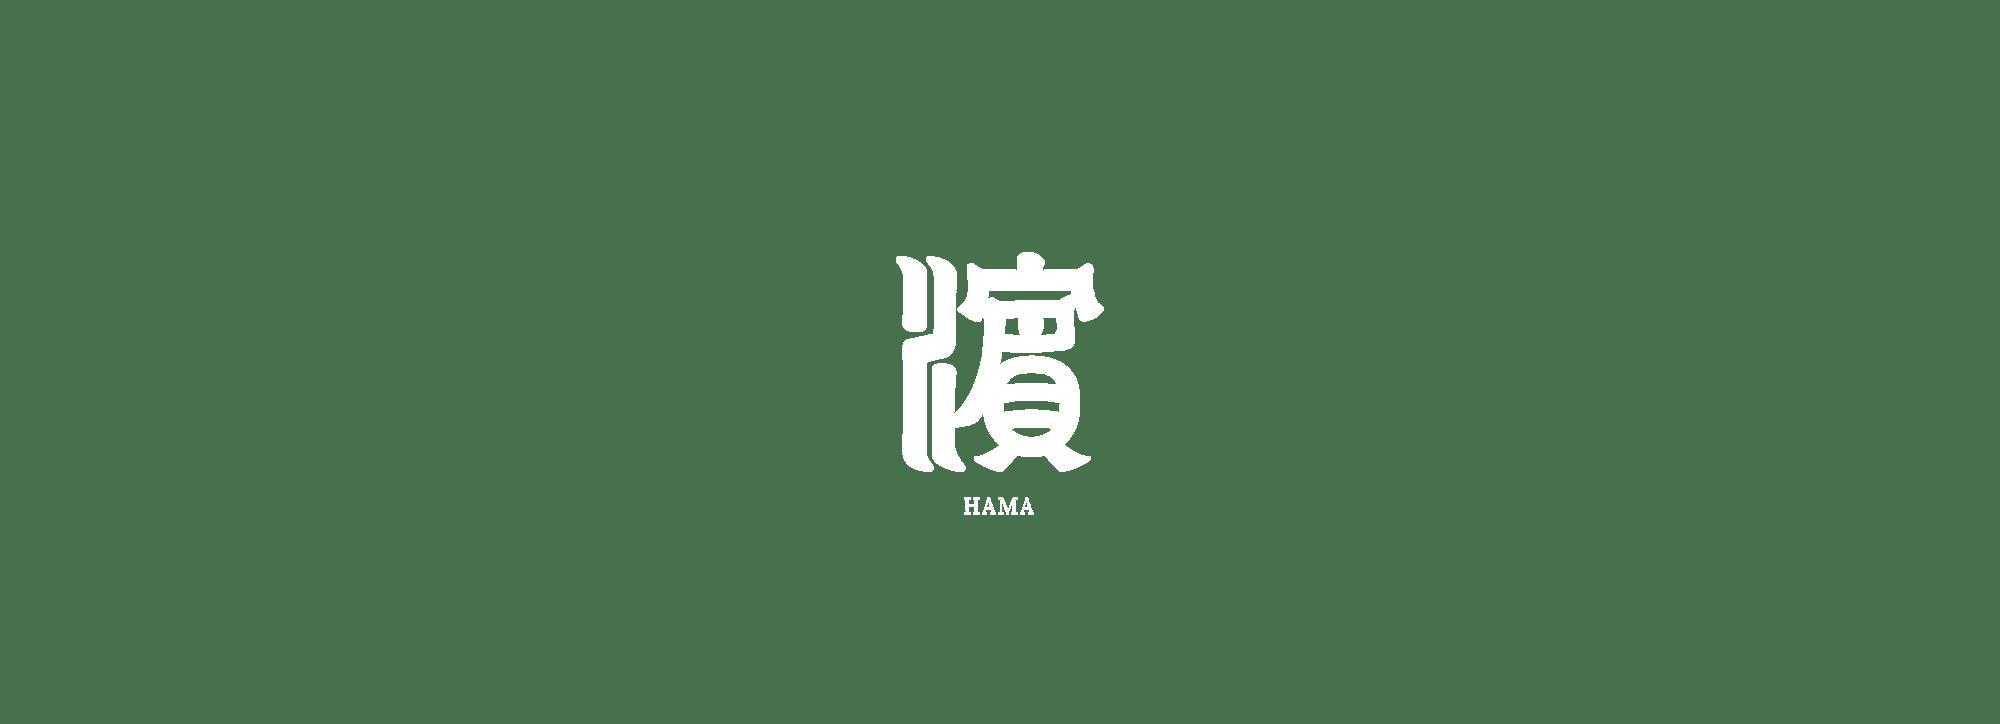 SAKAINOMA HOTEL 濵 logo